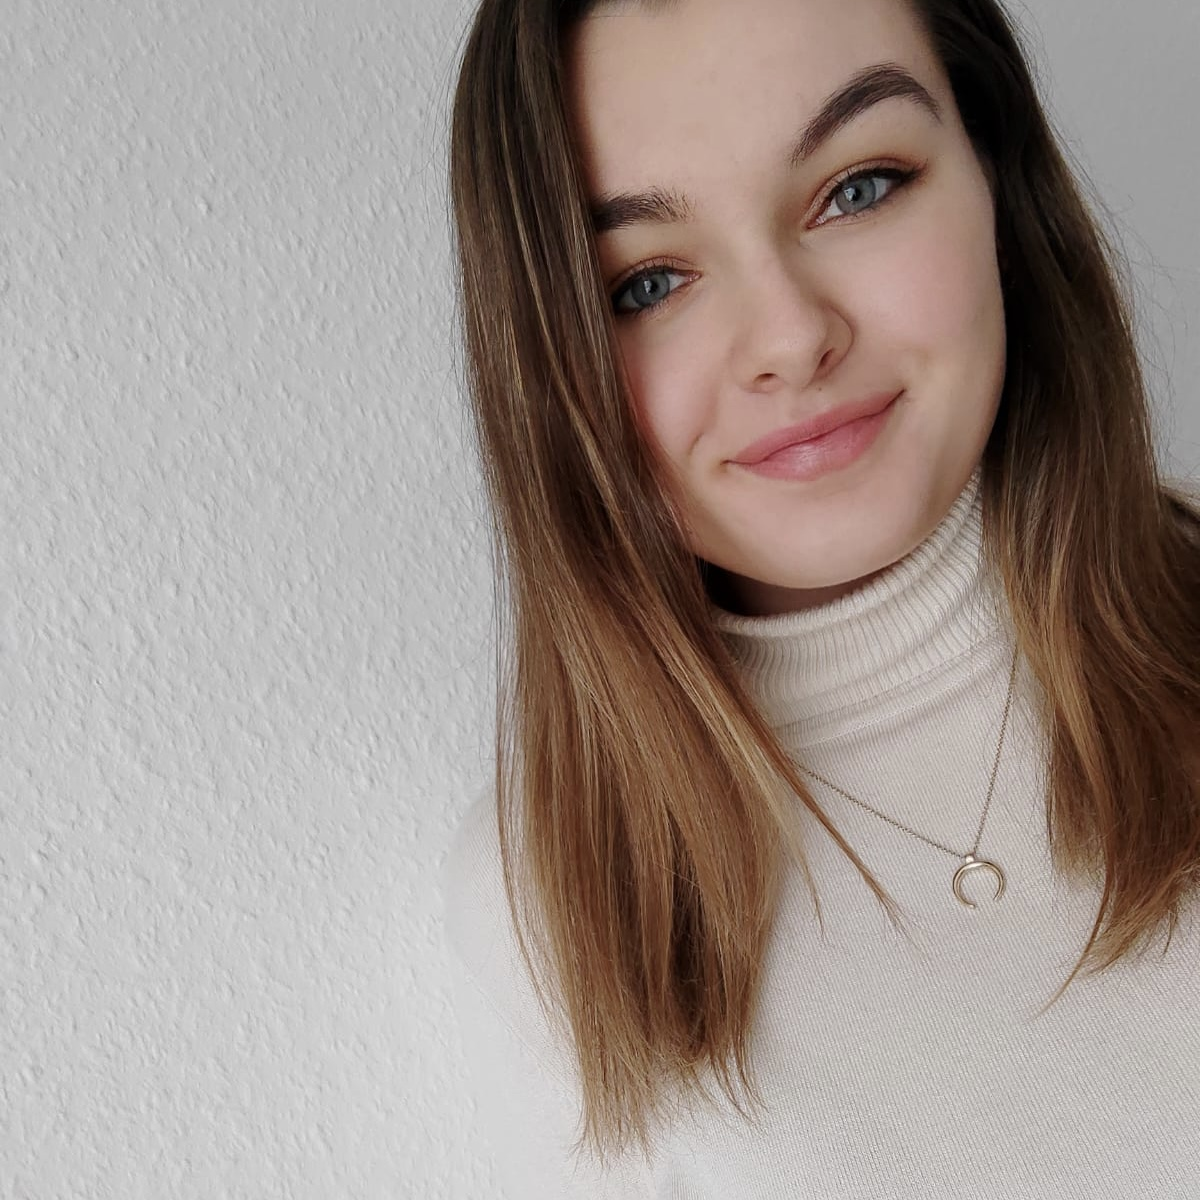 Julia Thiex